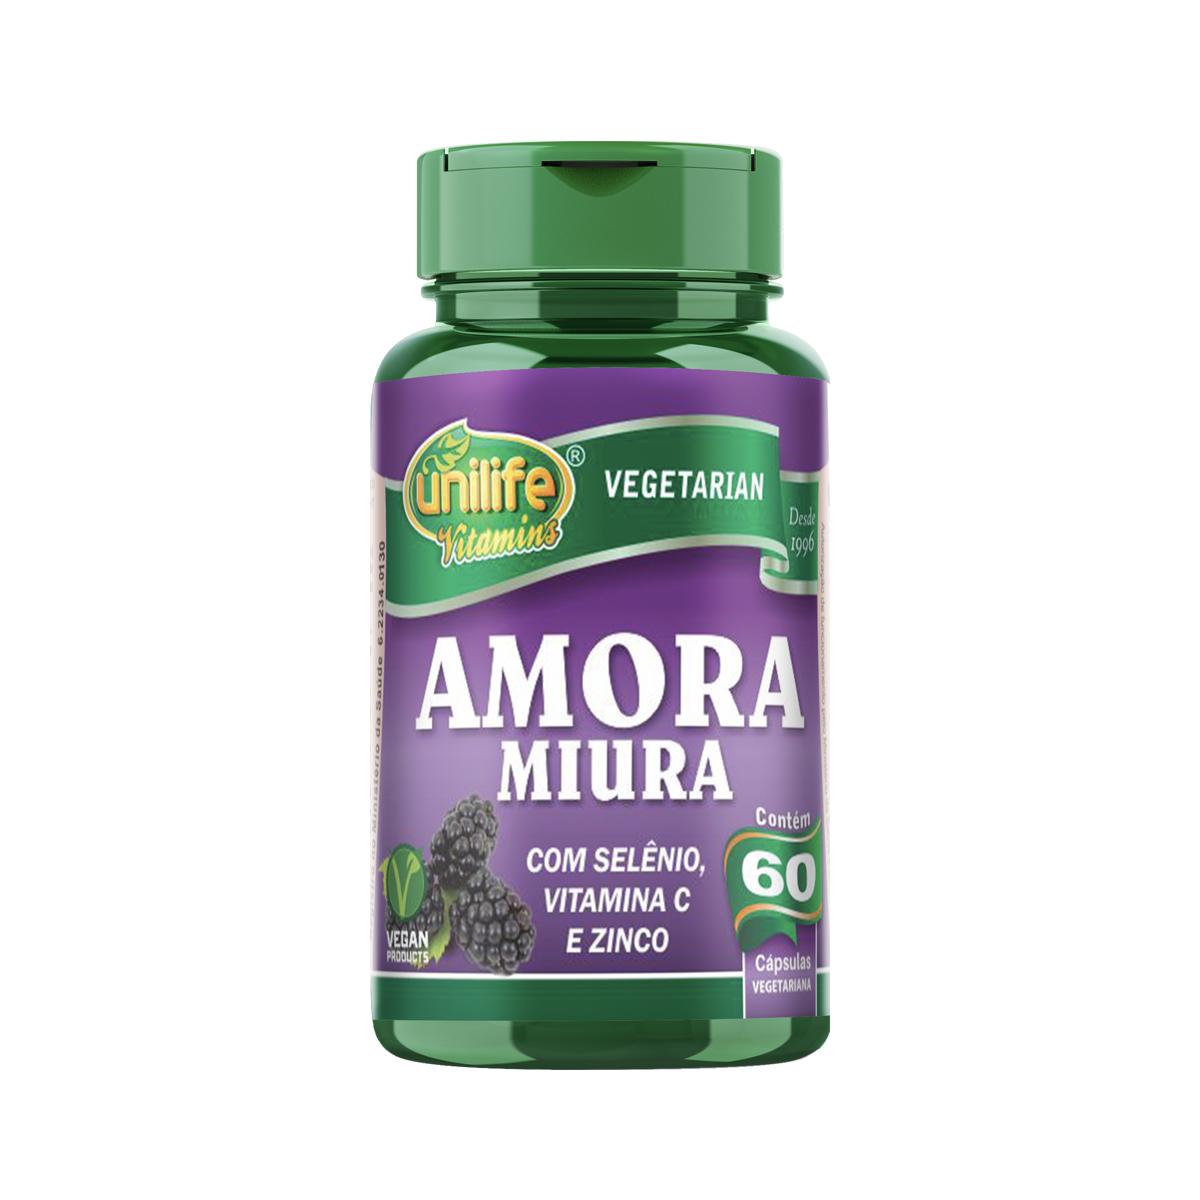 Amora Miúra 500mg 60 Cápsulas - Unilife